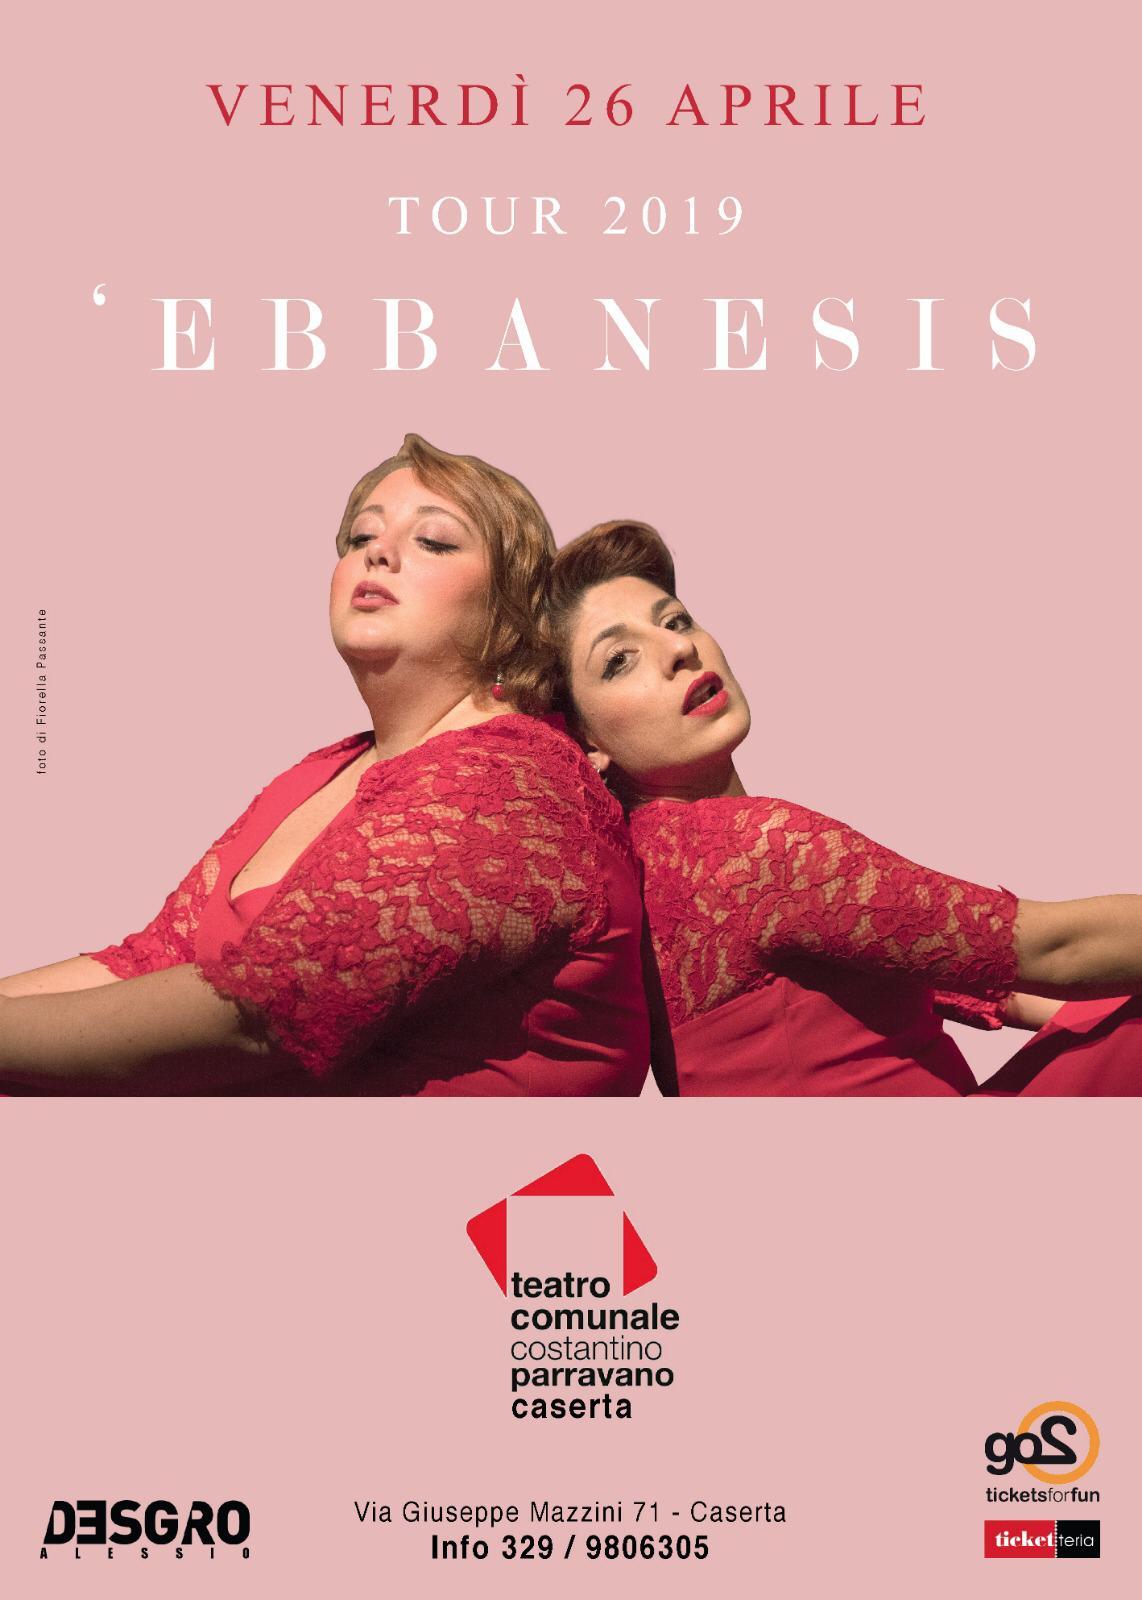 EBBANESIS - SERENVIVITY